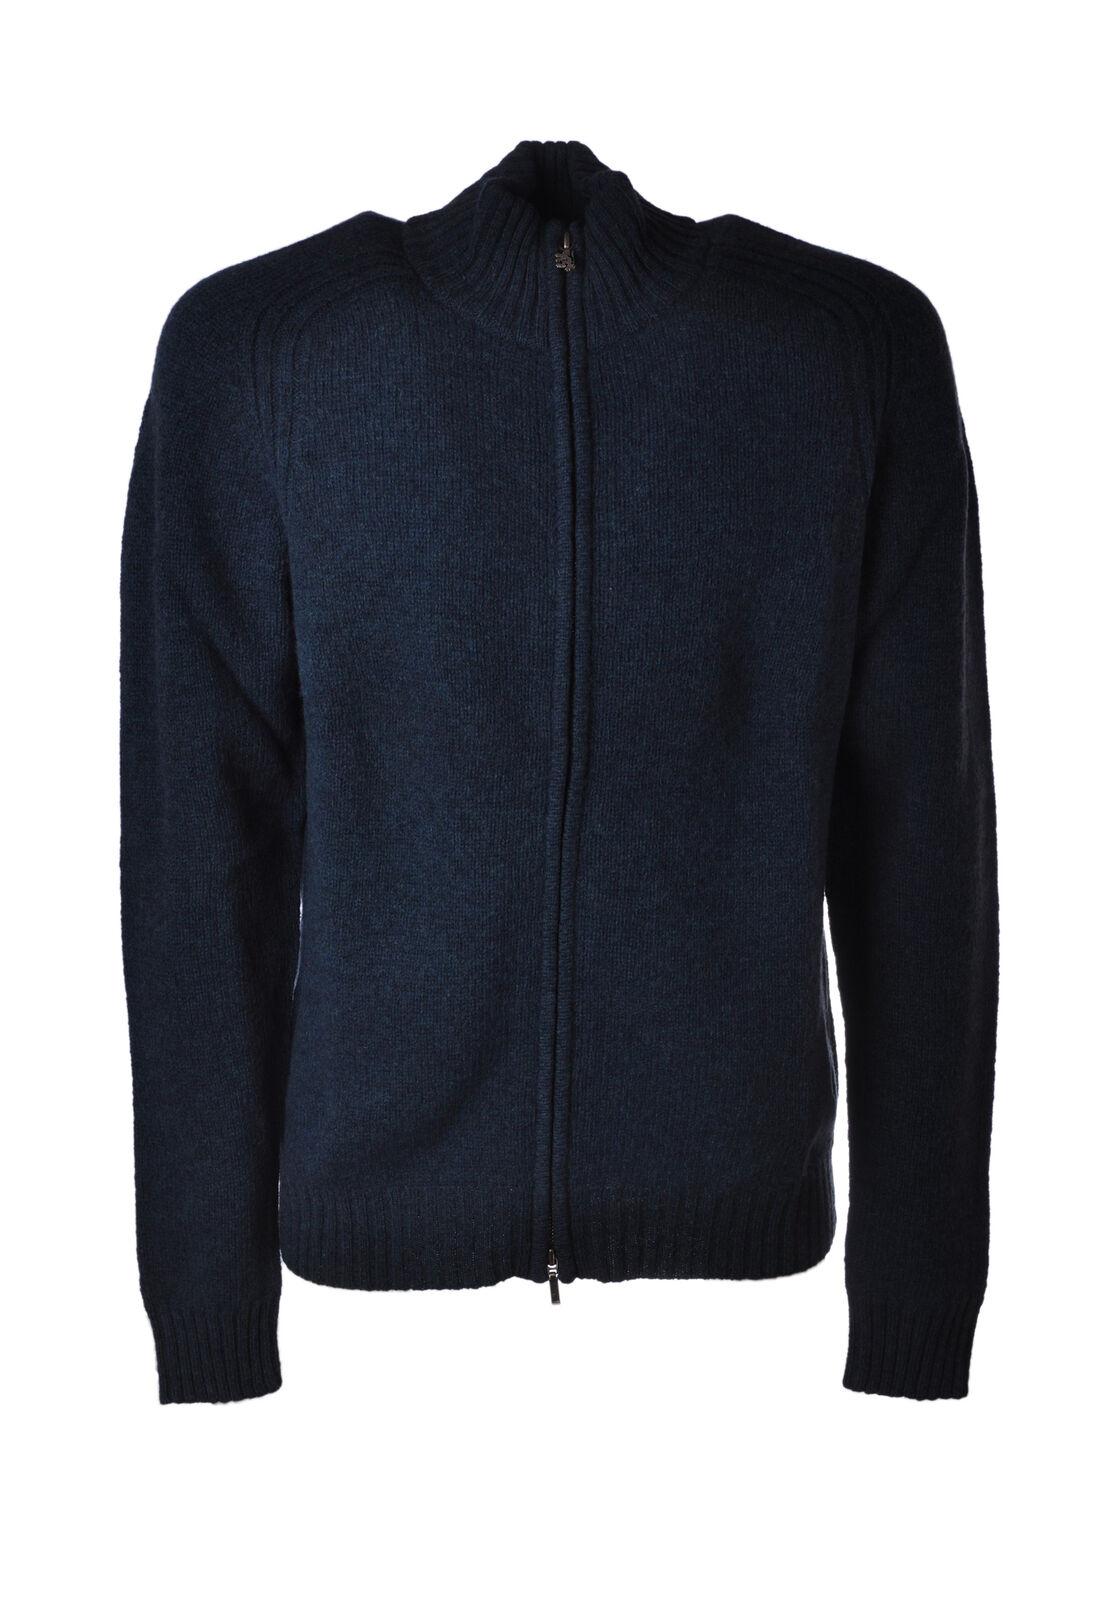 Pringle  -  Sweaters - Male - Green - 4662521A182338